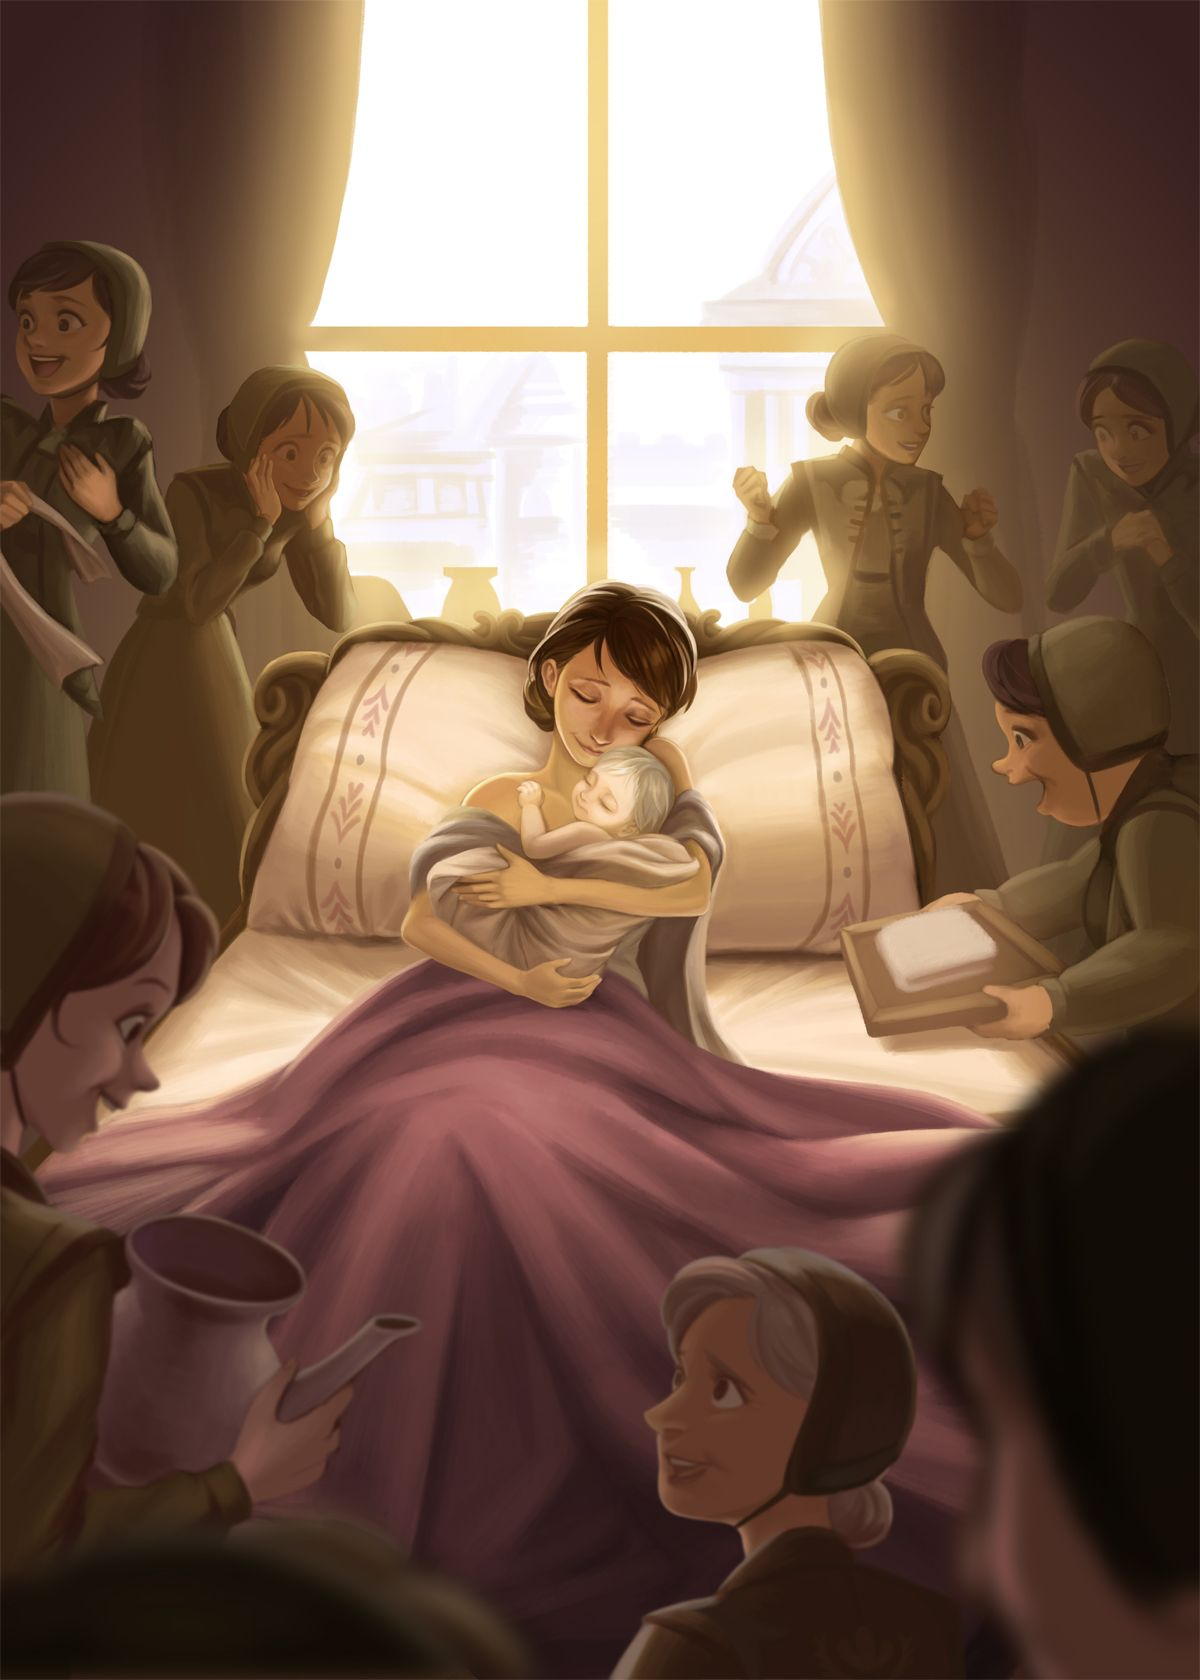 The birth of Elsa | Frozen! (All things Disney) | Pinterest